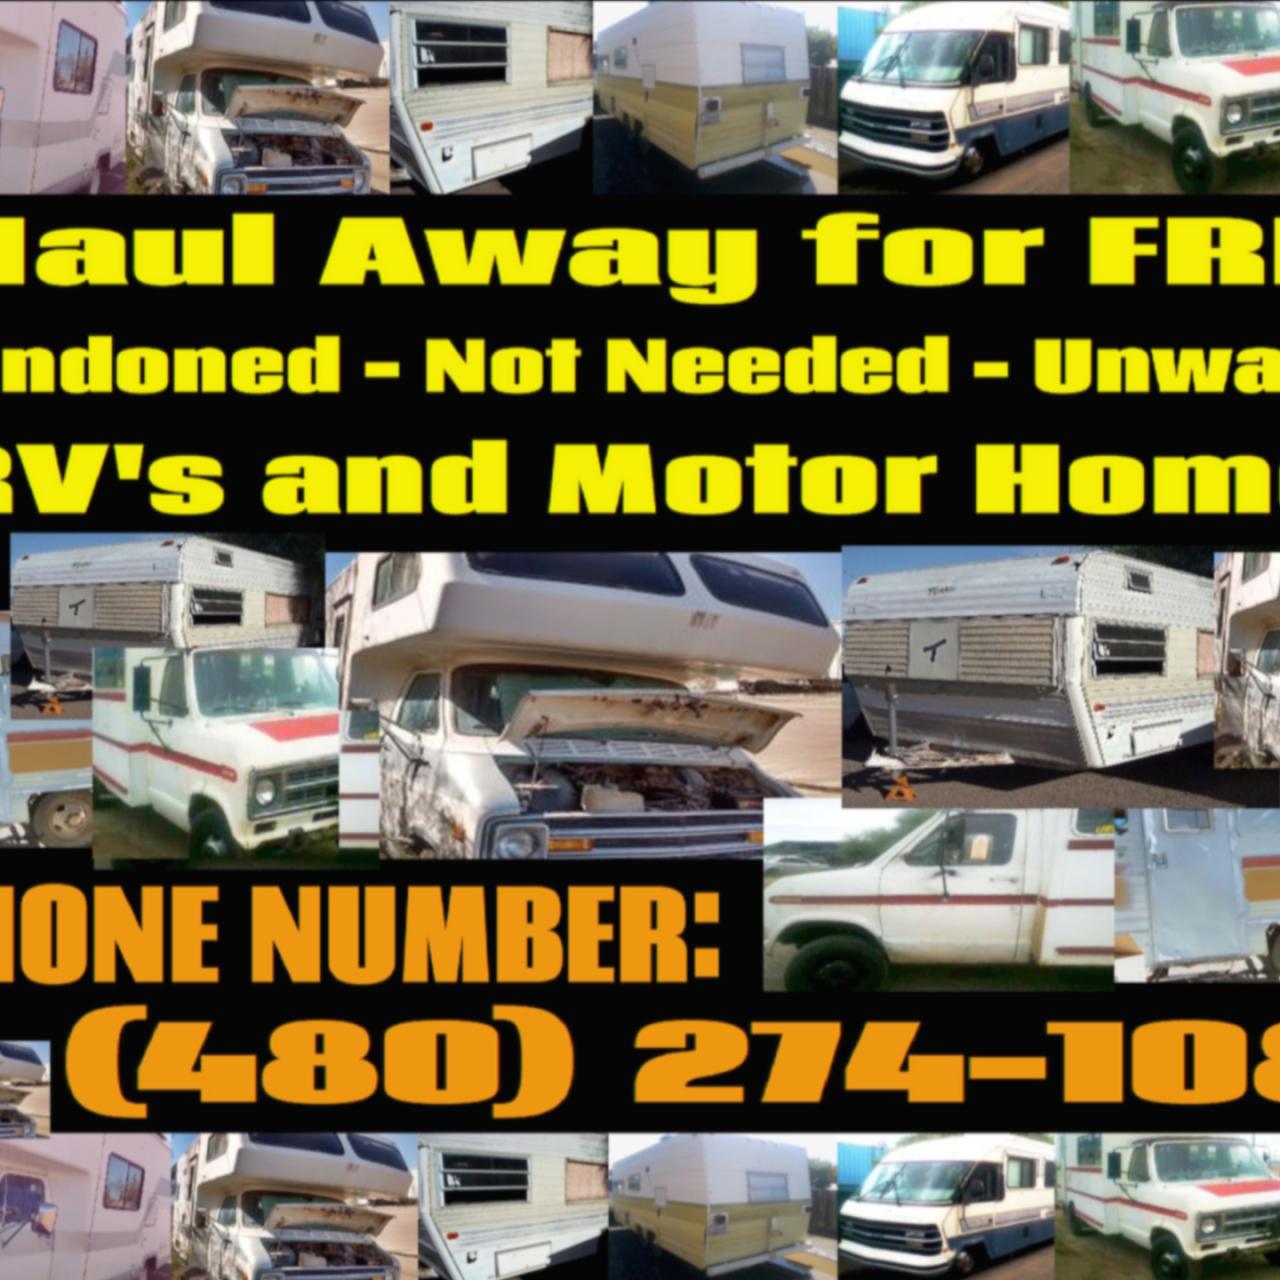 Auto Salvage Arizona - Junk Removal and Auto Salvage Yard in